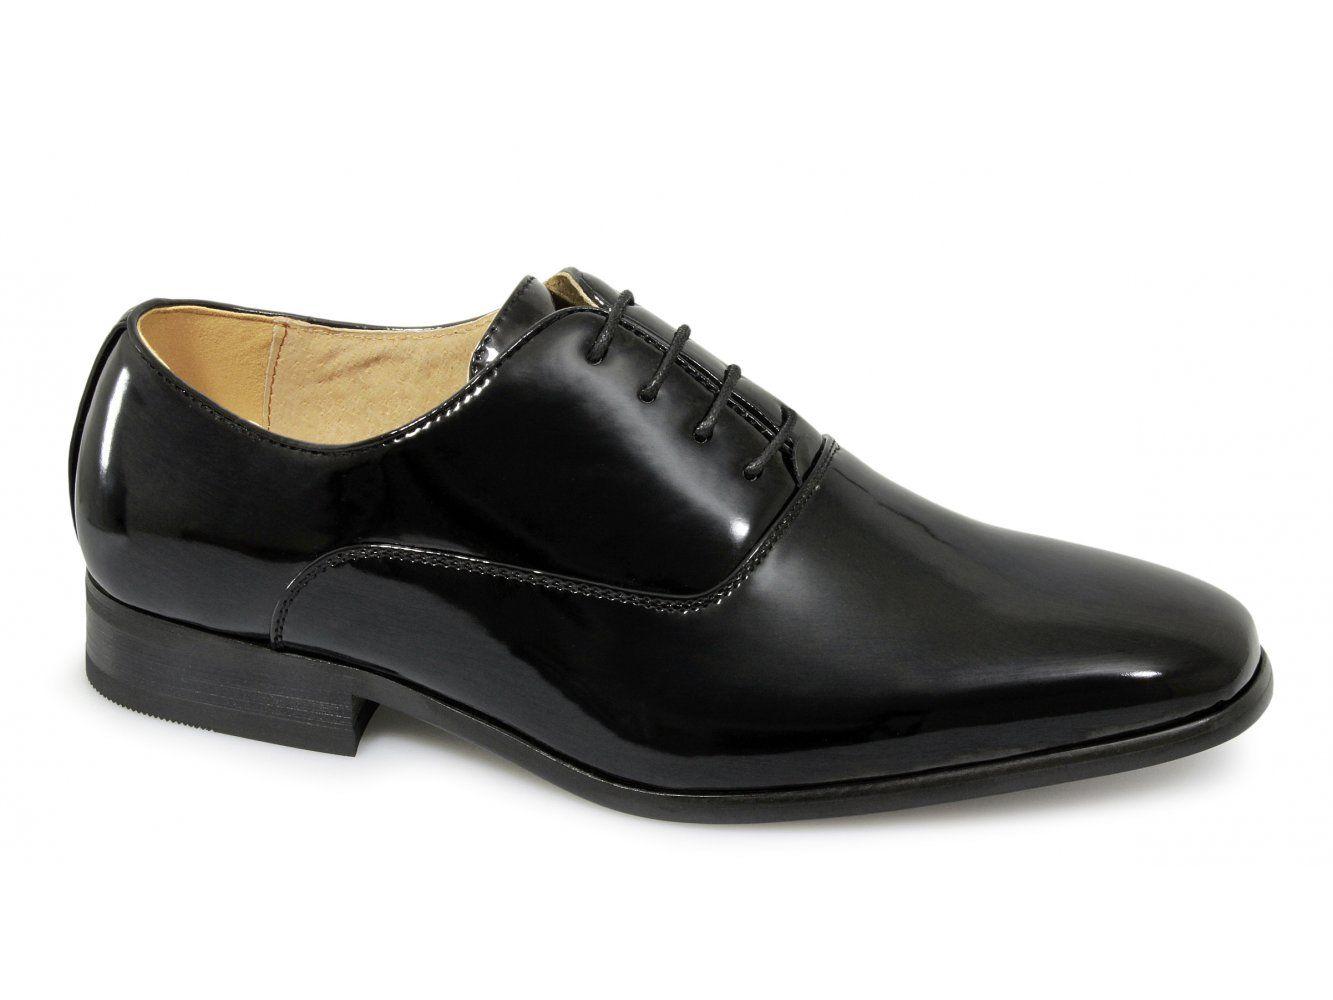 Black dress sandals for wedding - Boys Black Dress Shoes